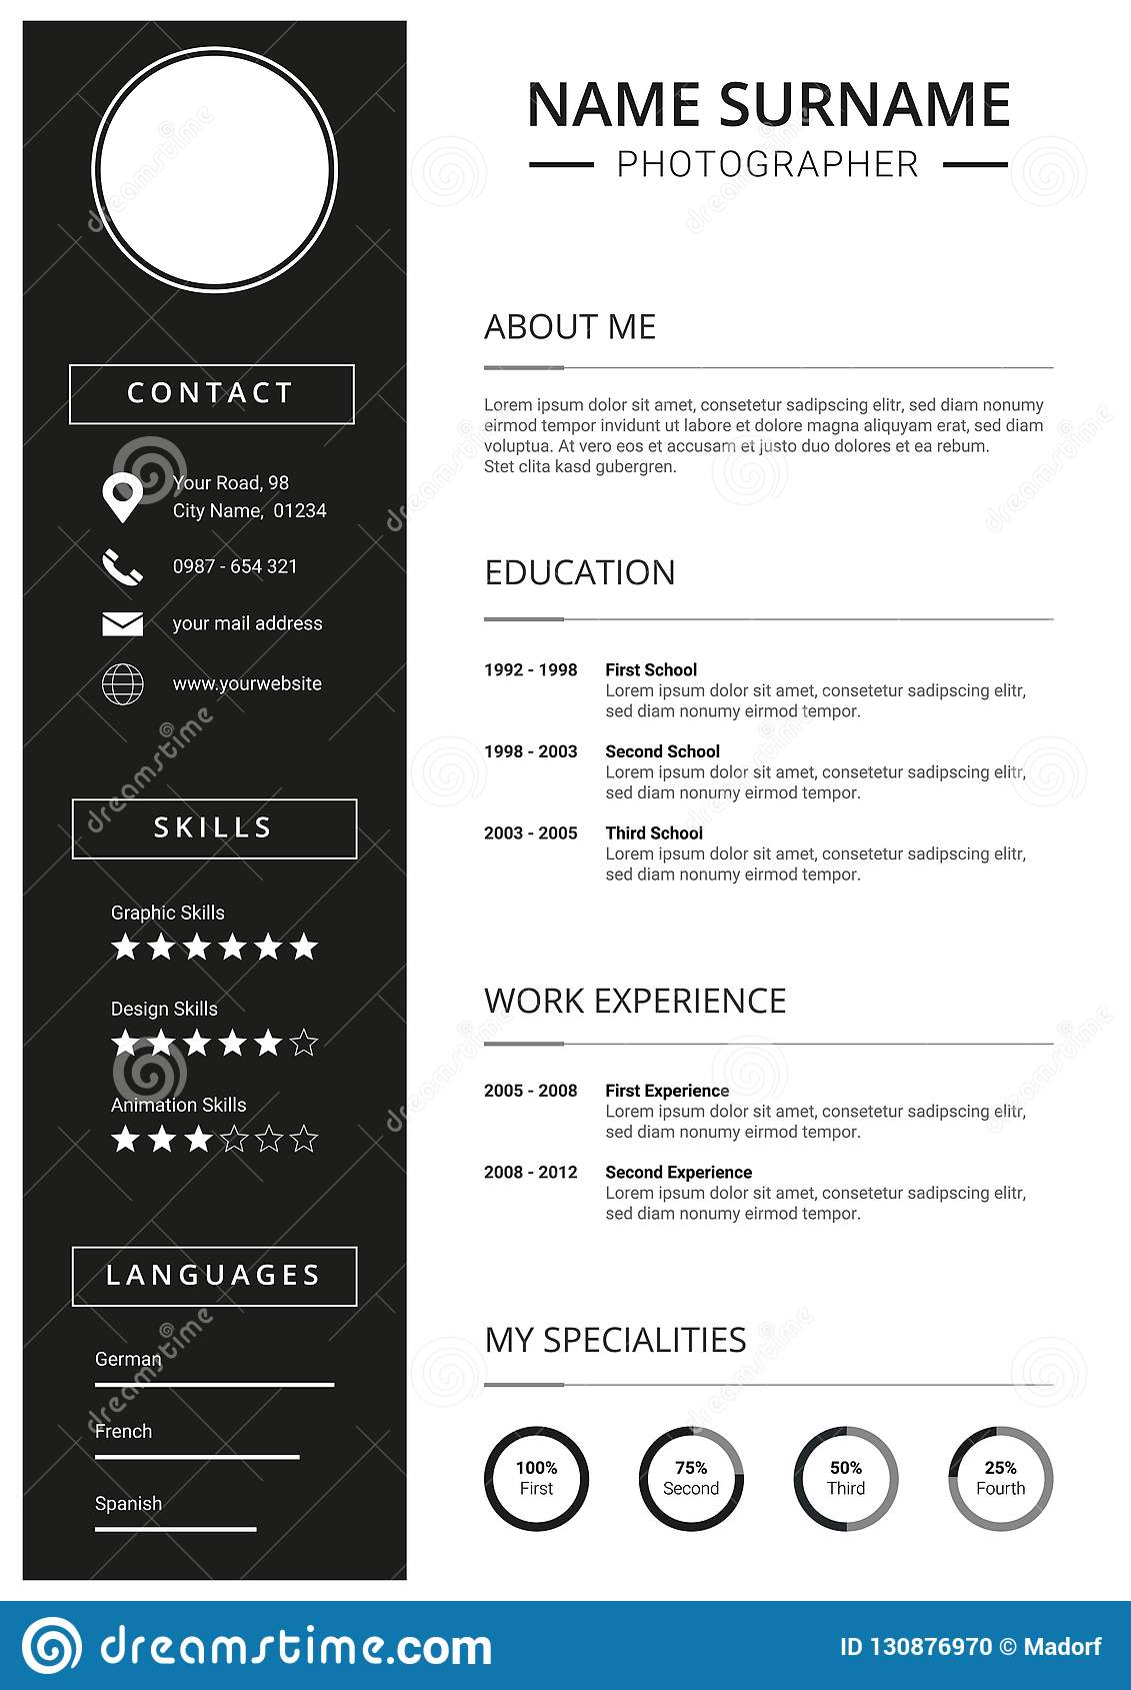 Minimal Resume Cv Template Clean Black And White Design Stock